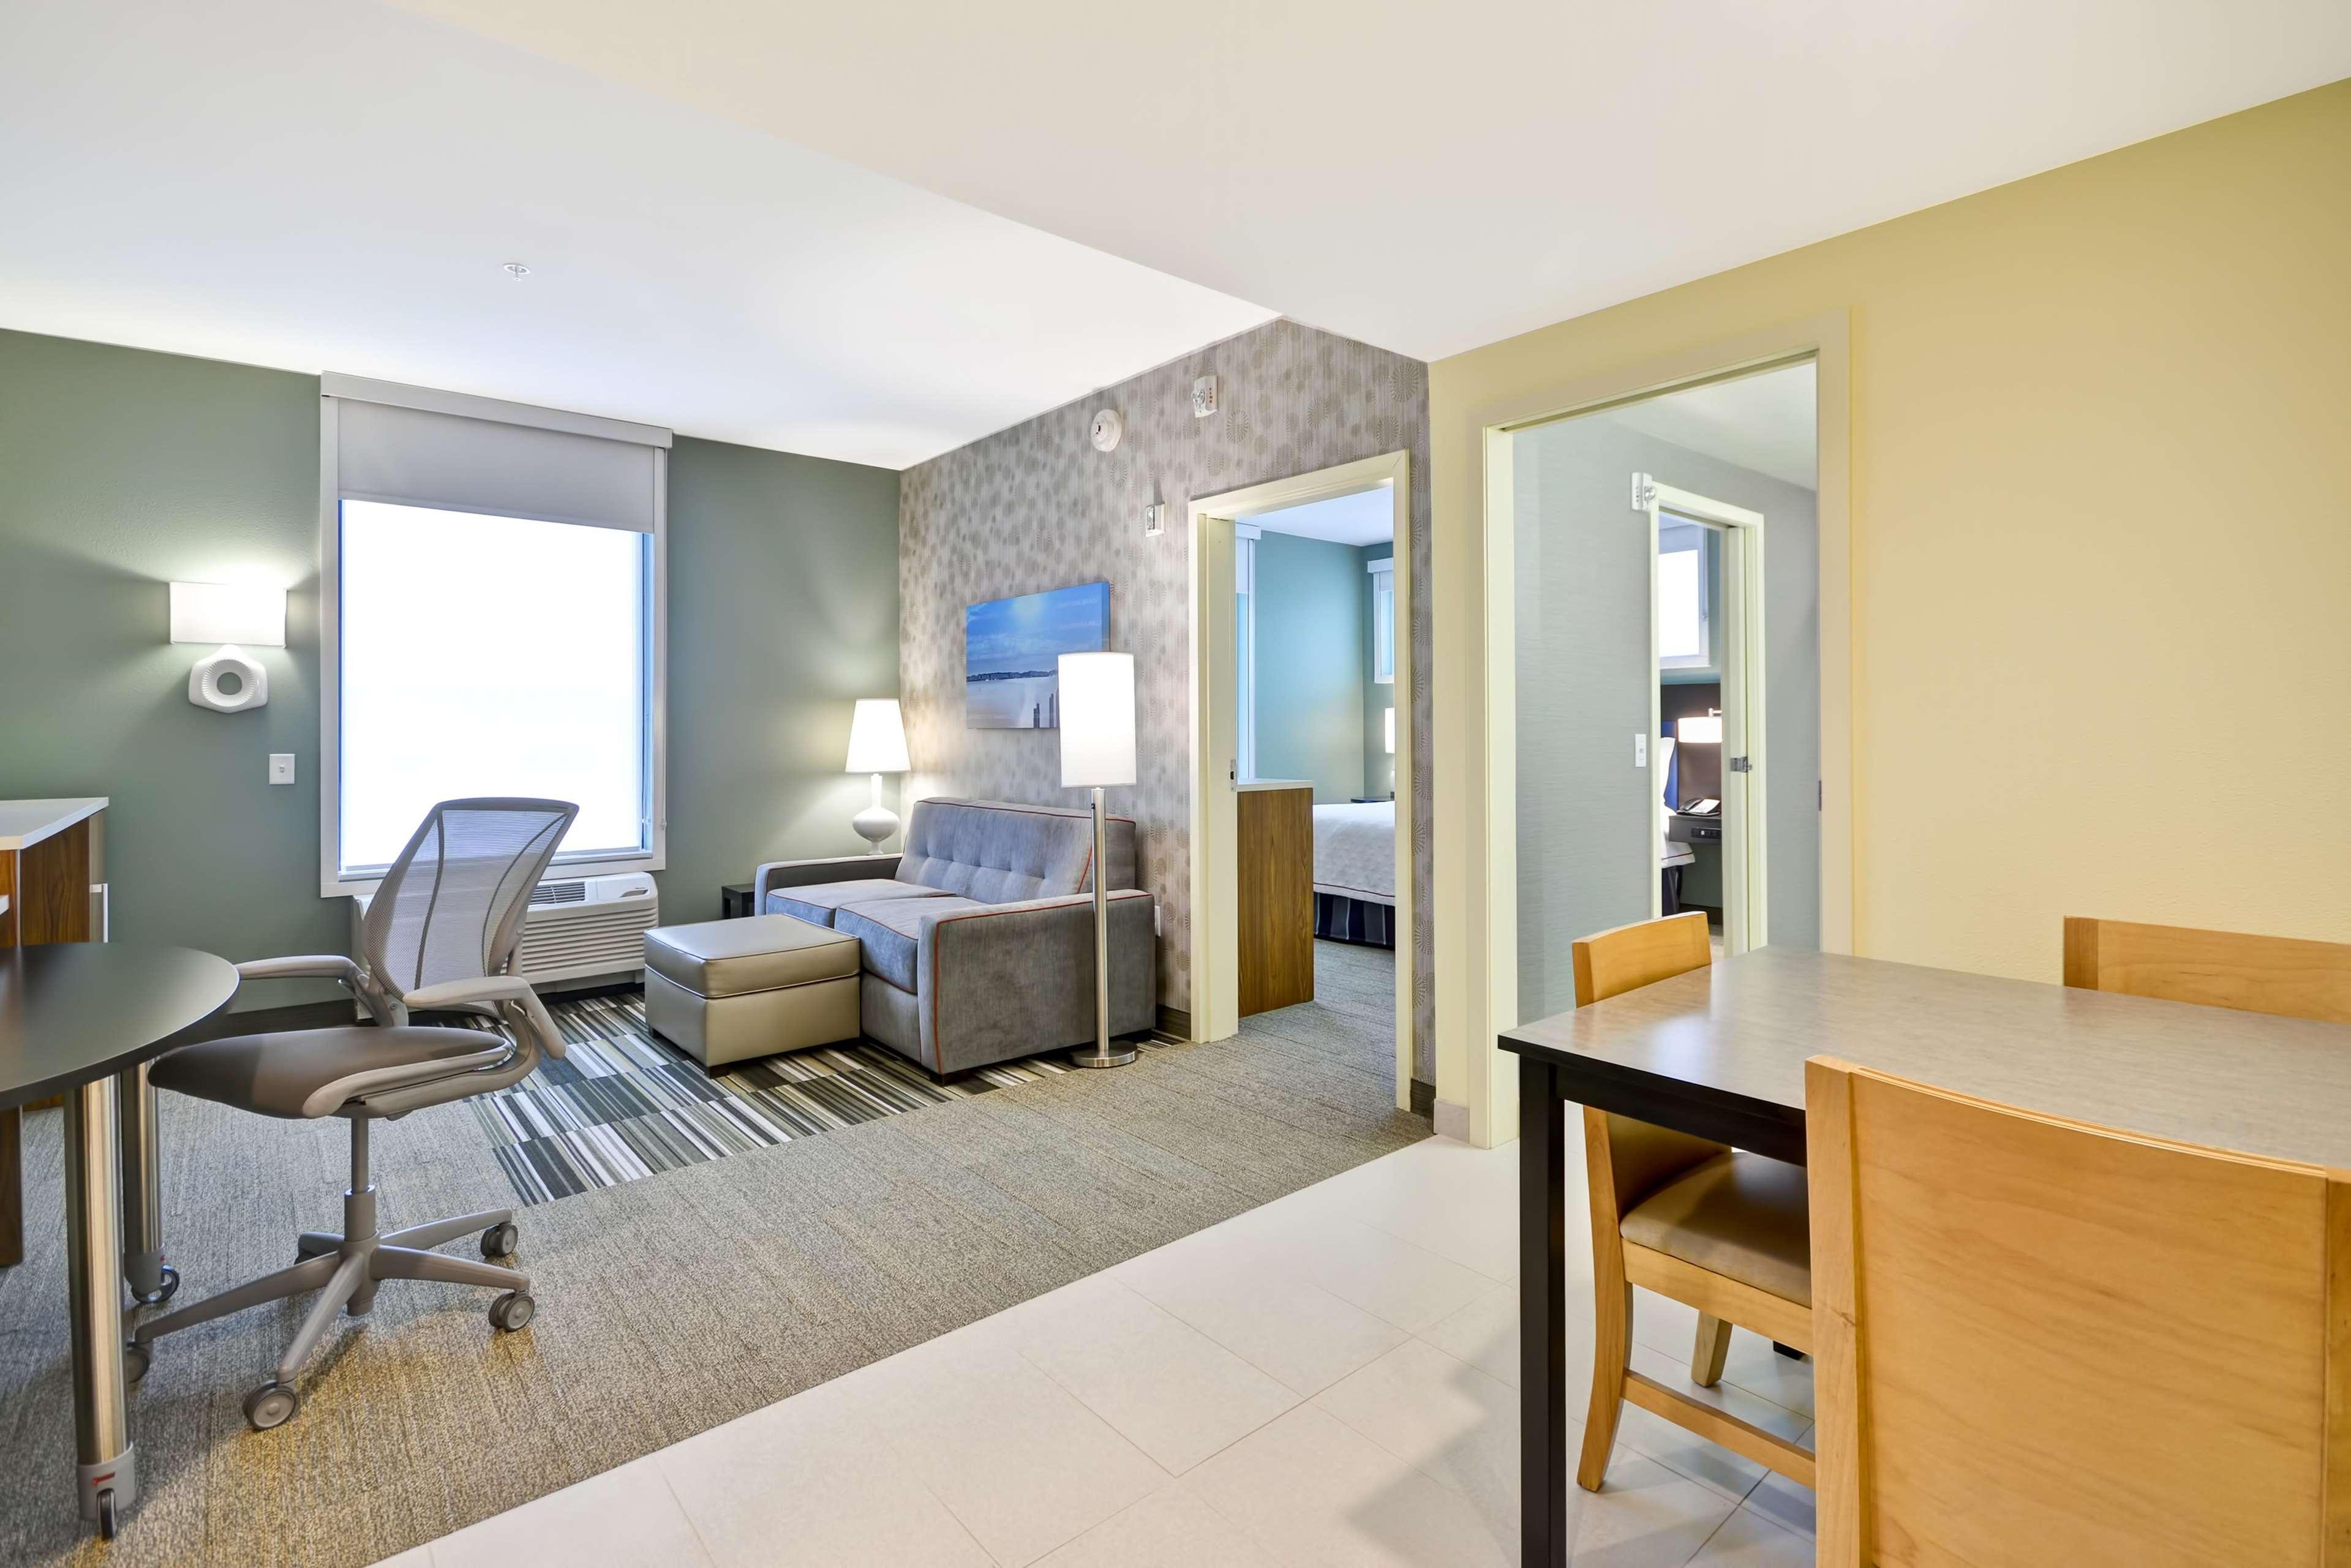 Home2 Suites By Hilton Minneapolis Eden Prairie